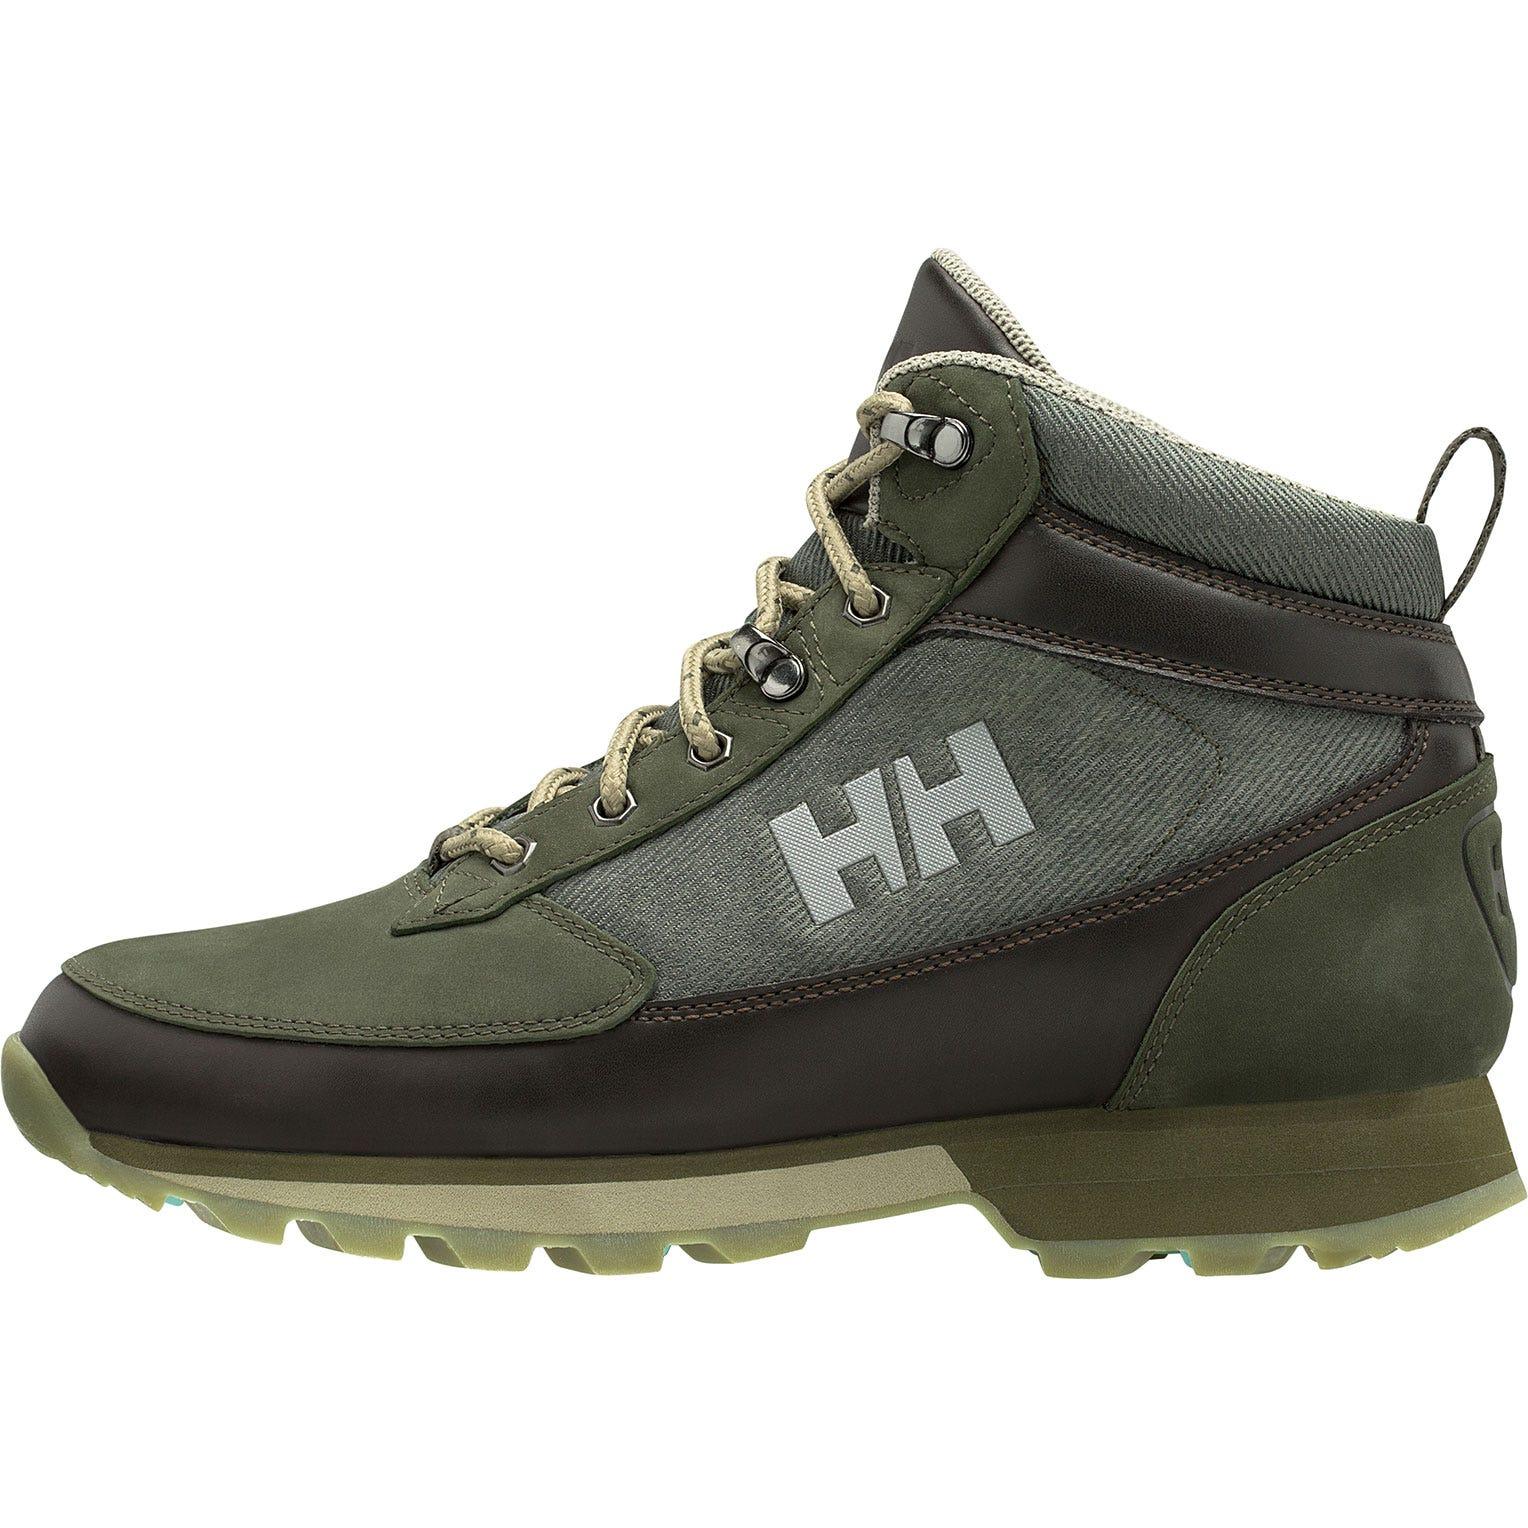 Helly Hansen W Chilcotin Womens Winter Boot Green 41/9.5